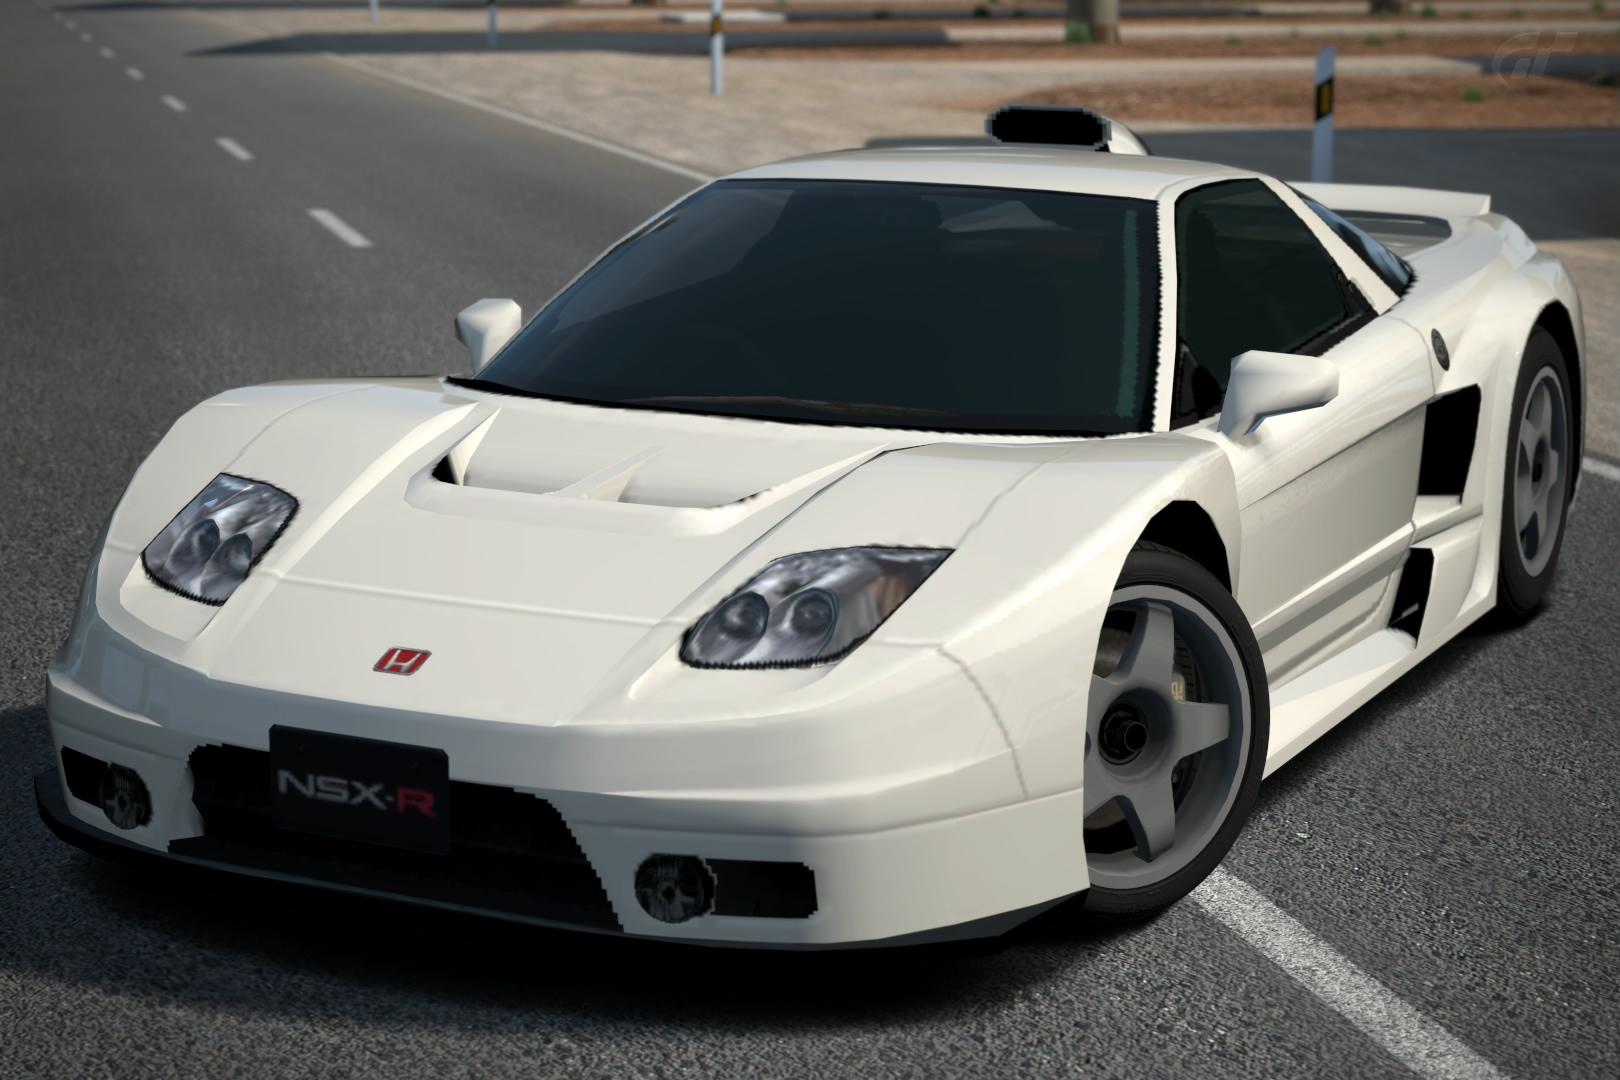 Honda Nsx R >> Honda Nsx R Prototype Lm Road Car Gran Turismo Wiki Fandom